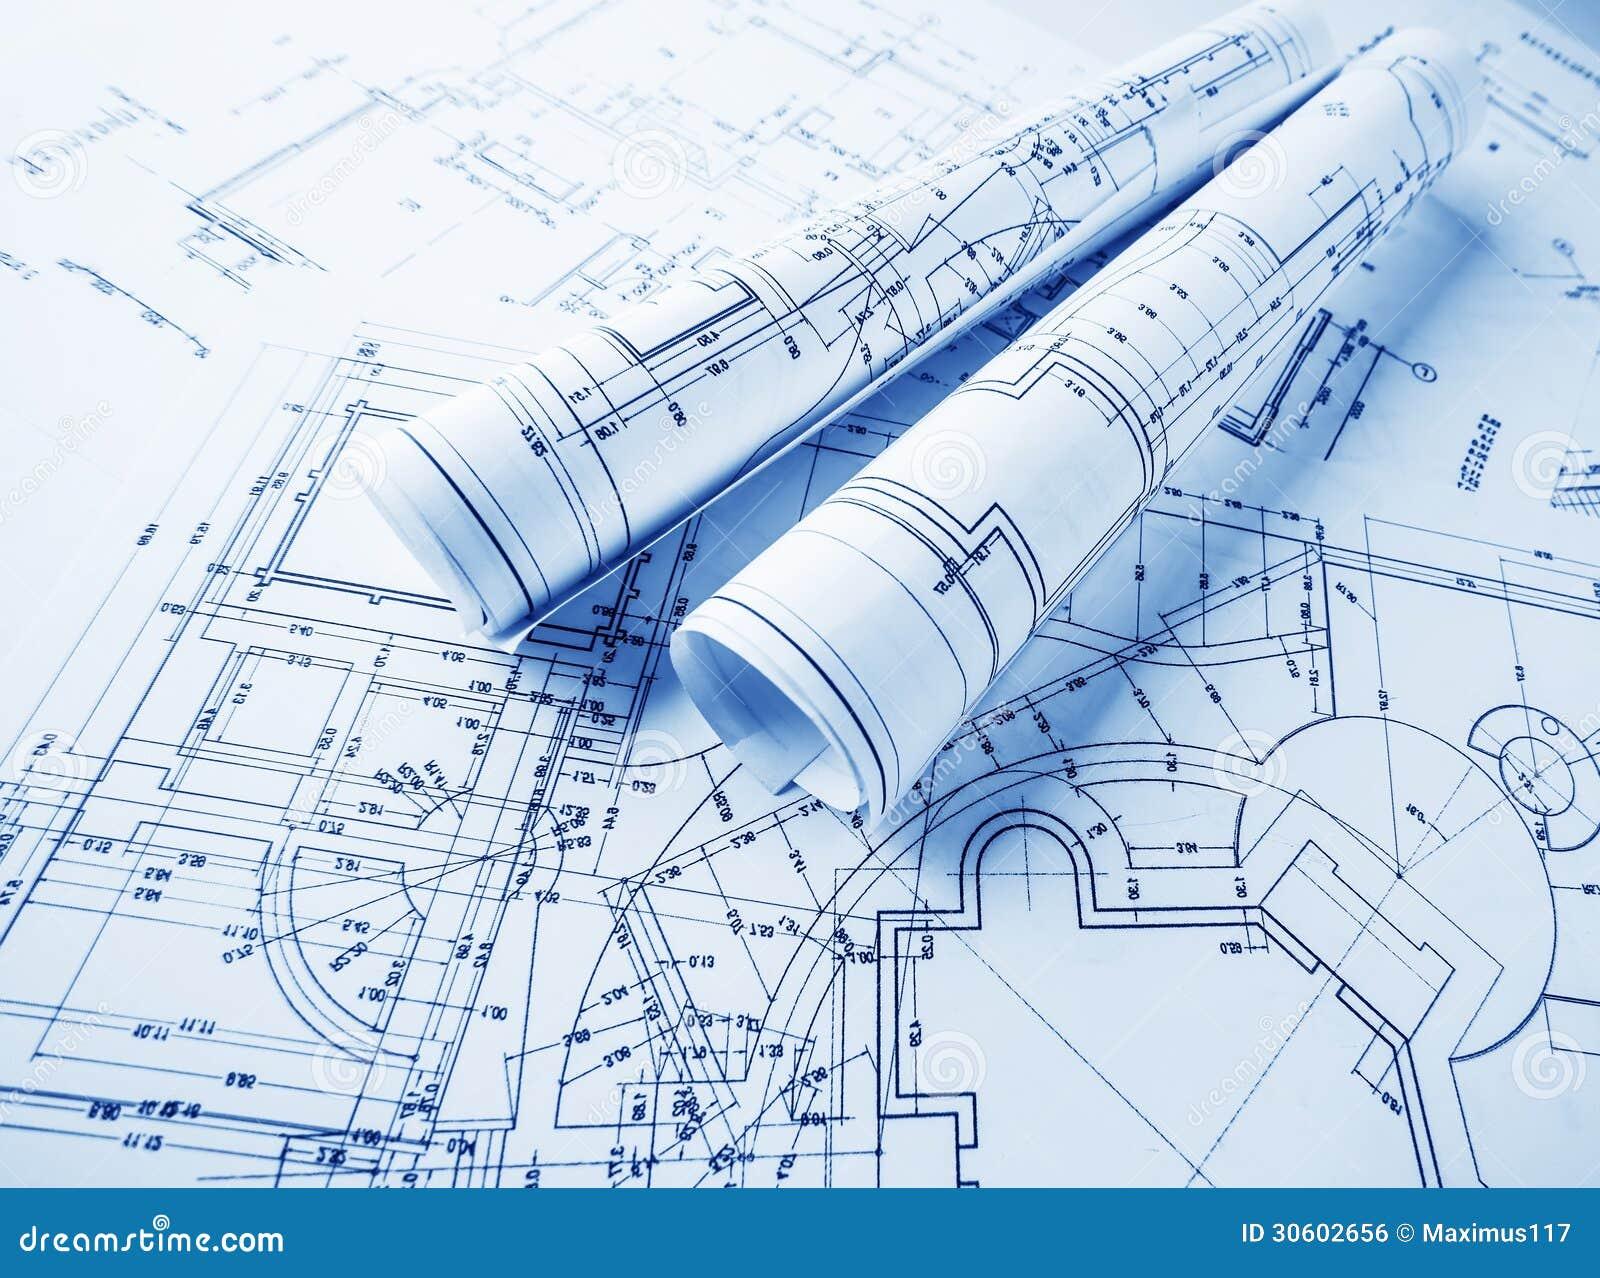 3d blueprint house designs kerala house designs house design mycreca royalty free stock image architectural blueprints rolls part project image30602656 malvernweather Choice Image